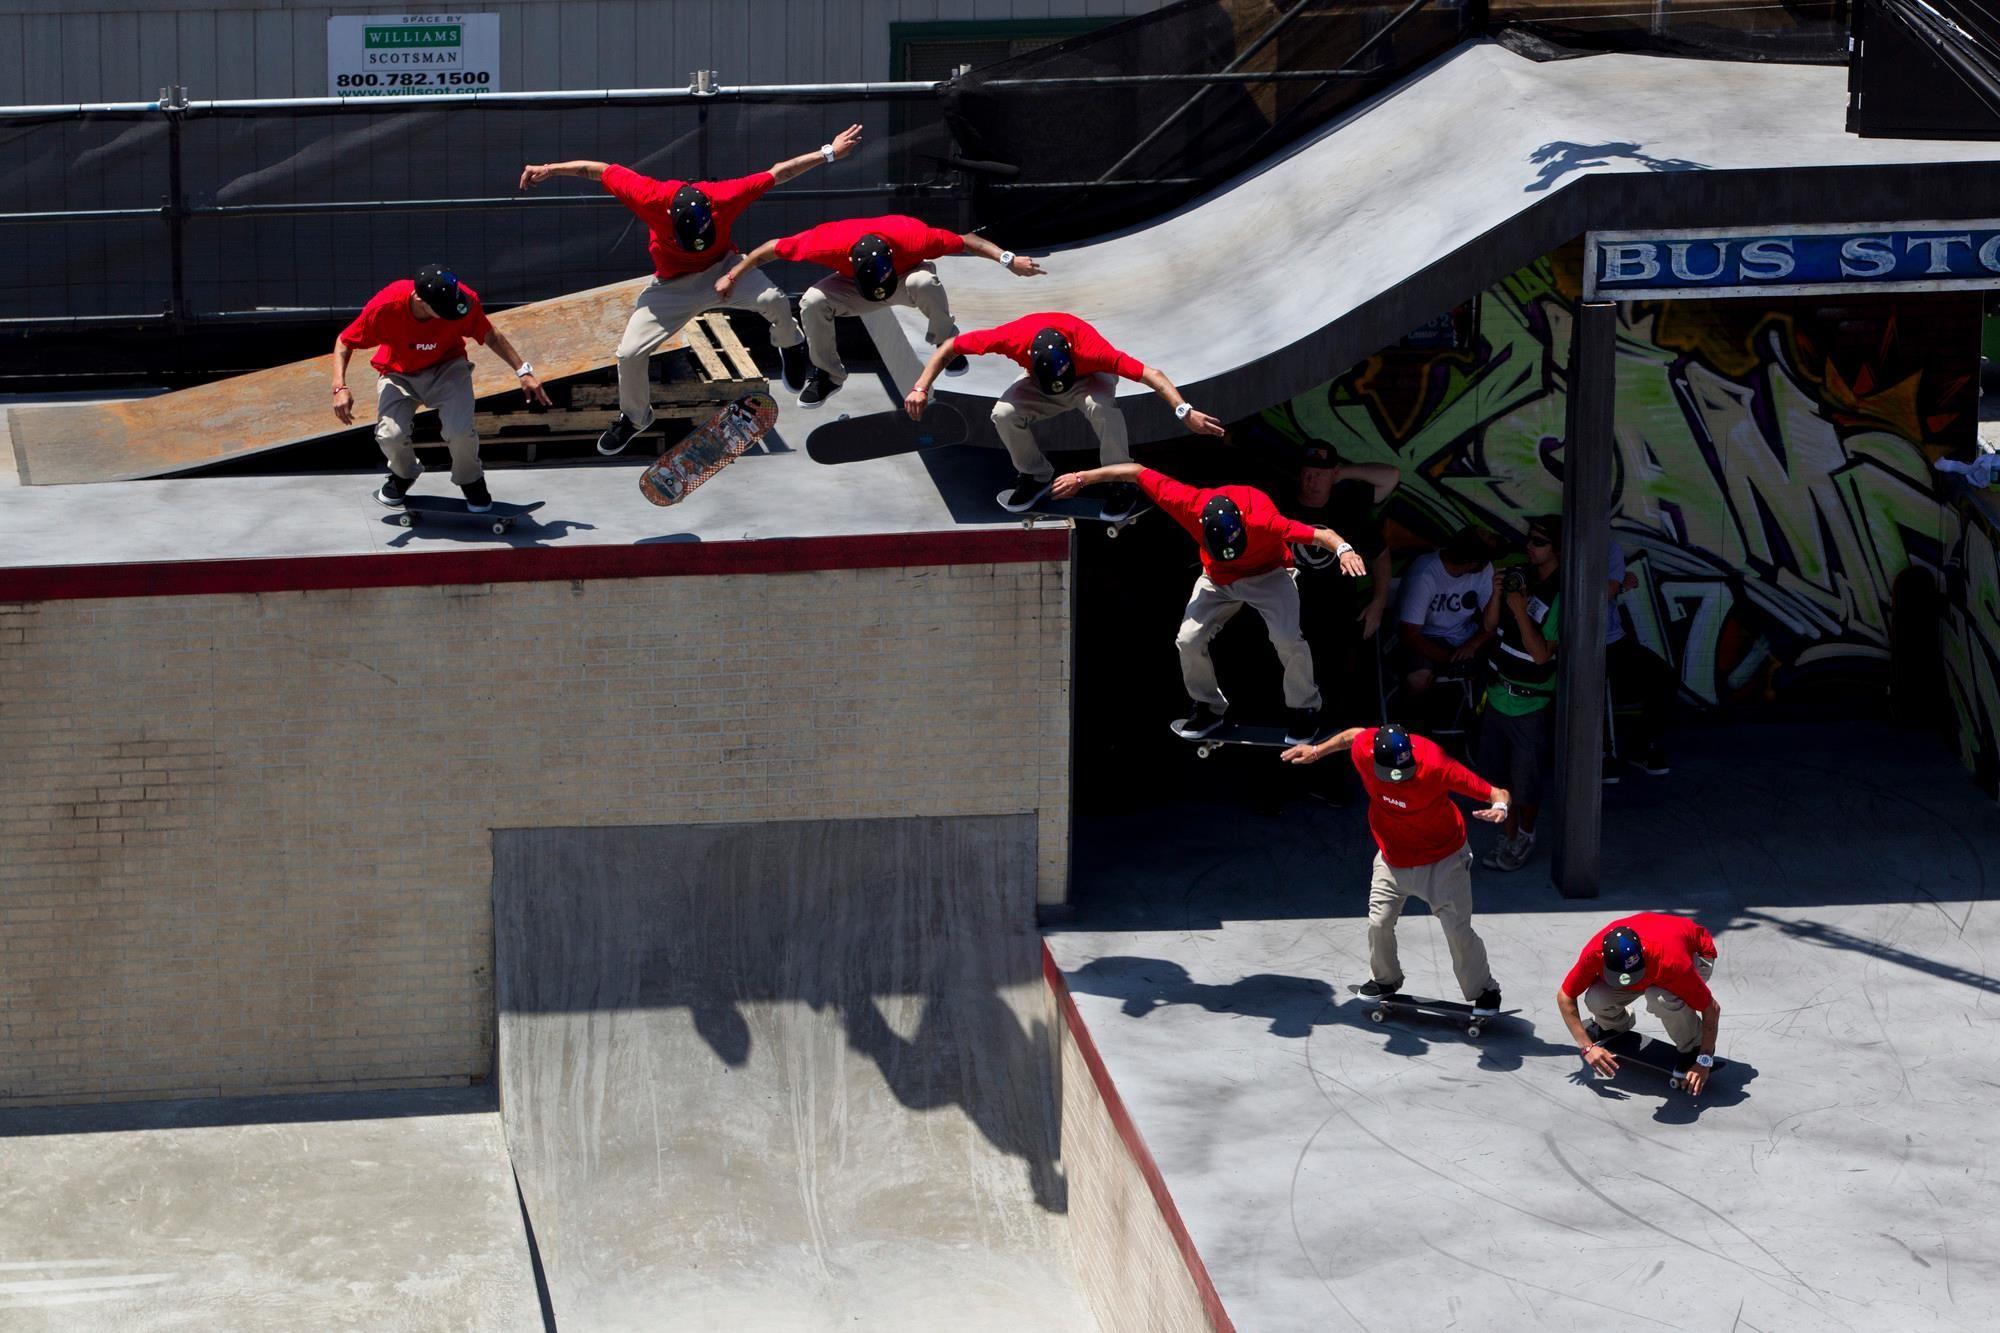 skater xgames | Ryan sheckler, Skateboard, X games